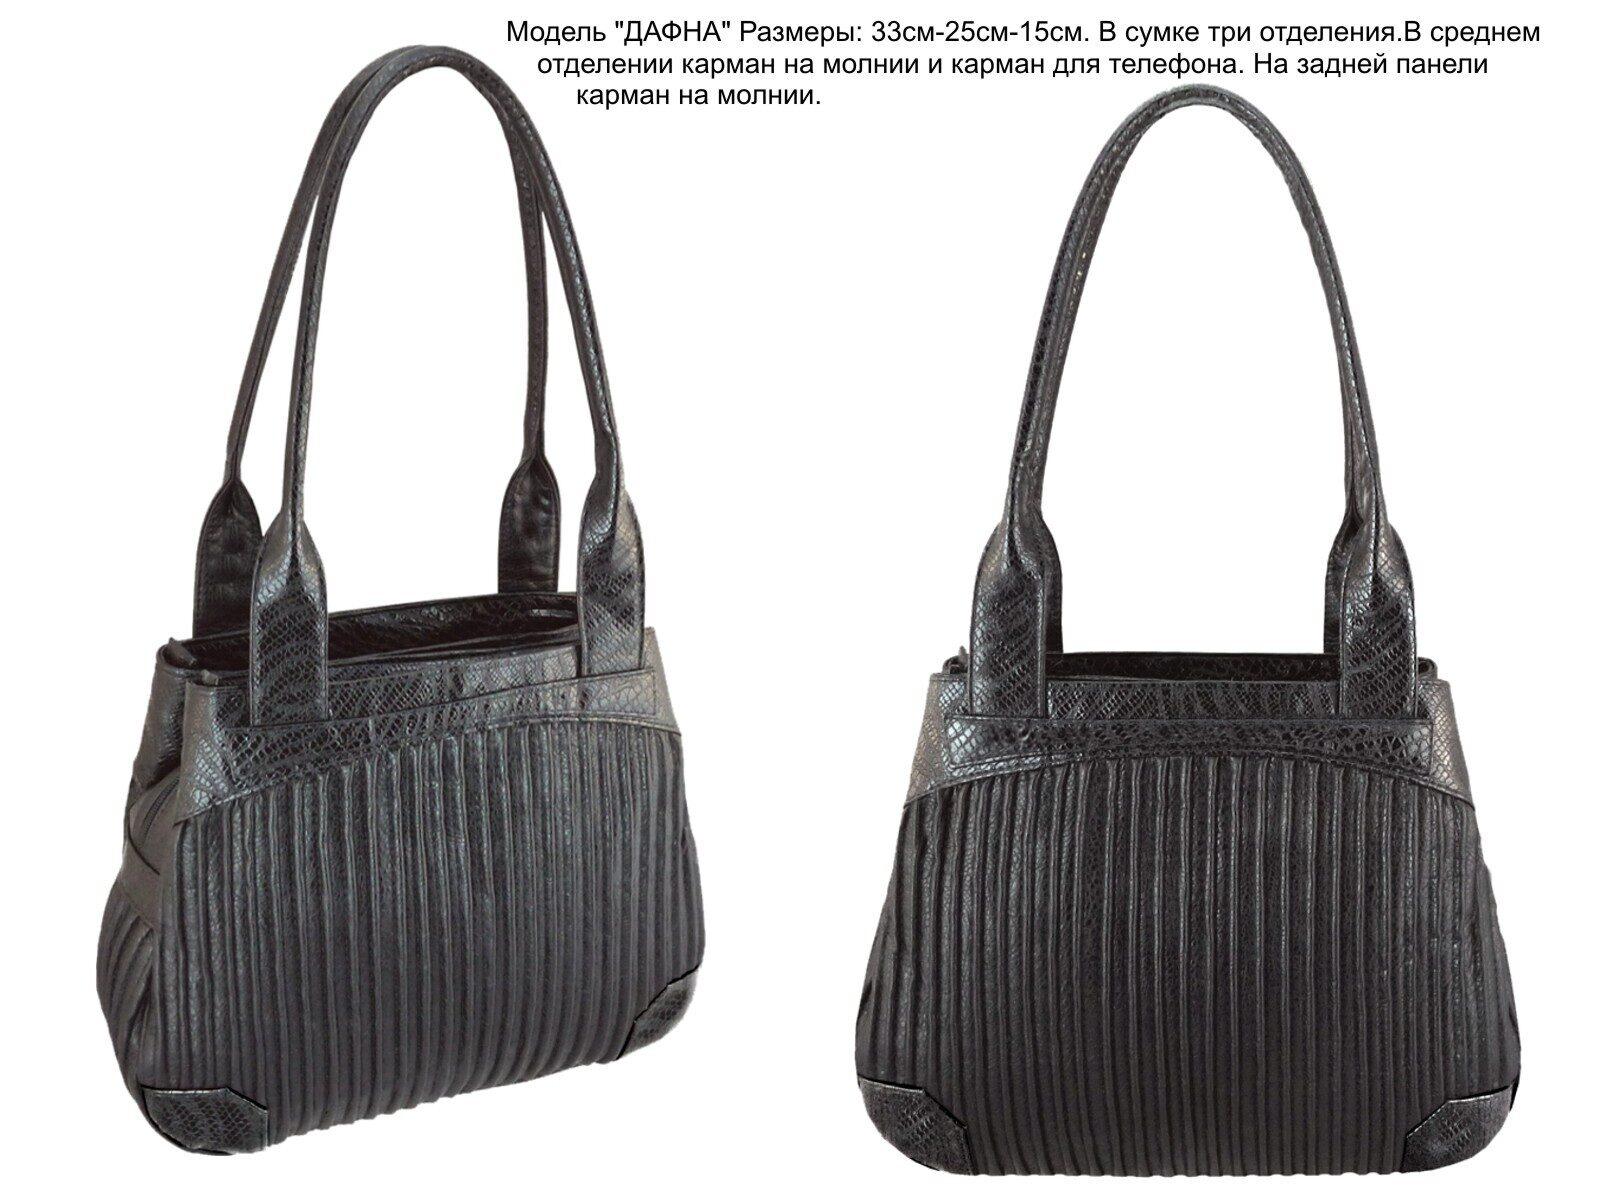 b47d51b1a848 Женская сумка ; сумка женская ; производство женских сумок ...